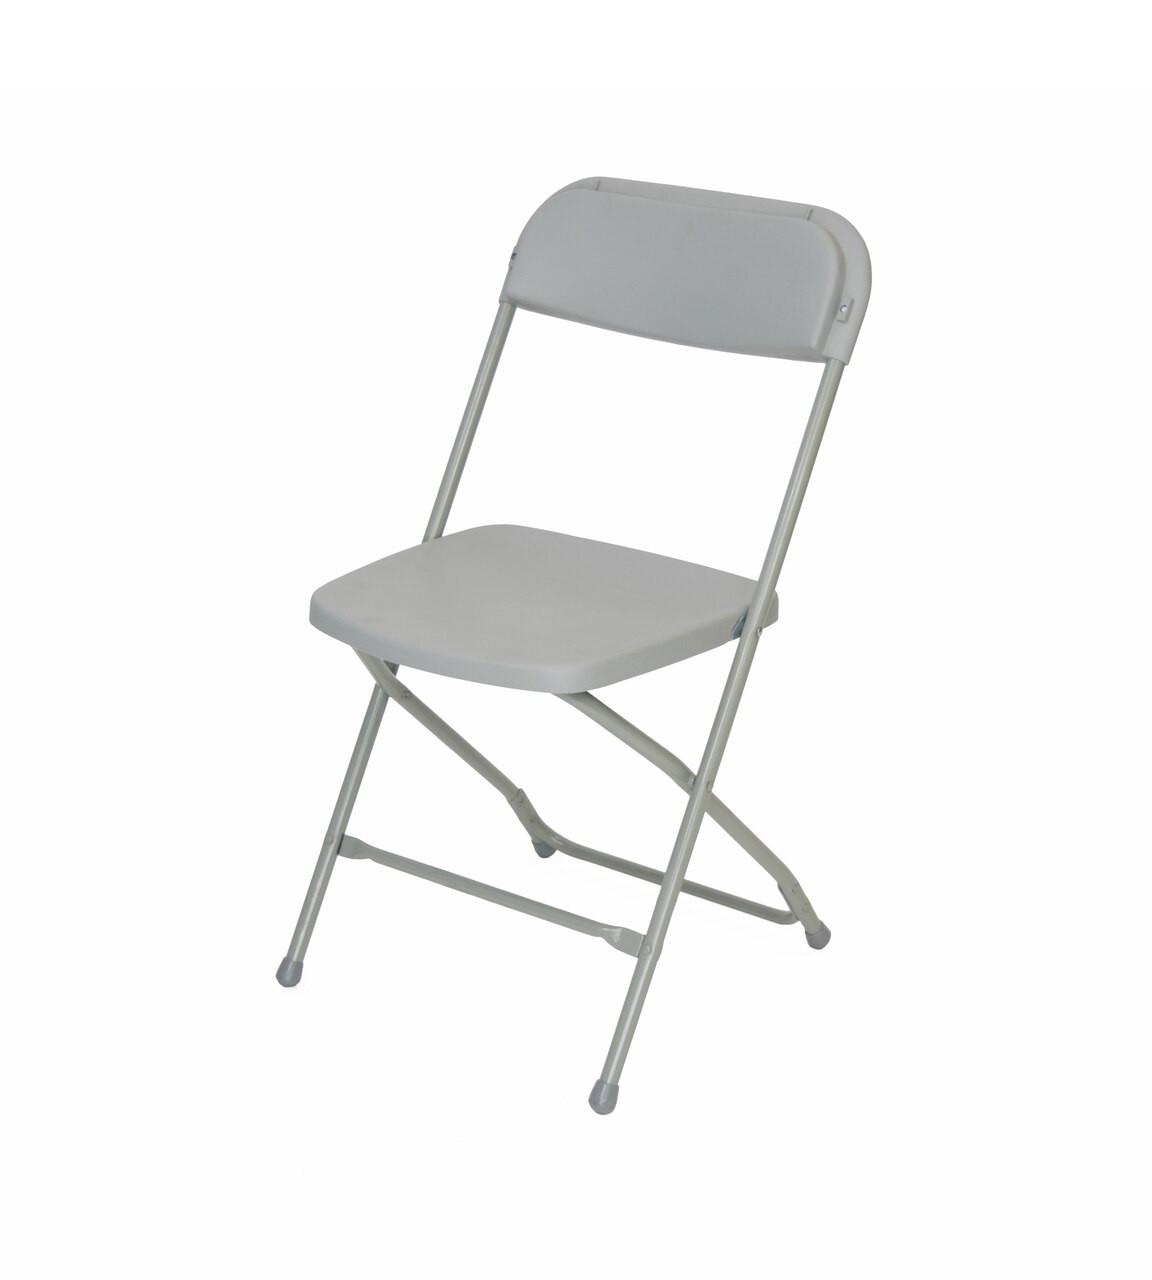 Titan Plastic Folding Chair Premium Rental Style - 730lb Capacity